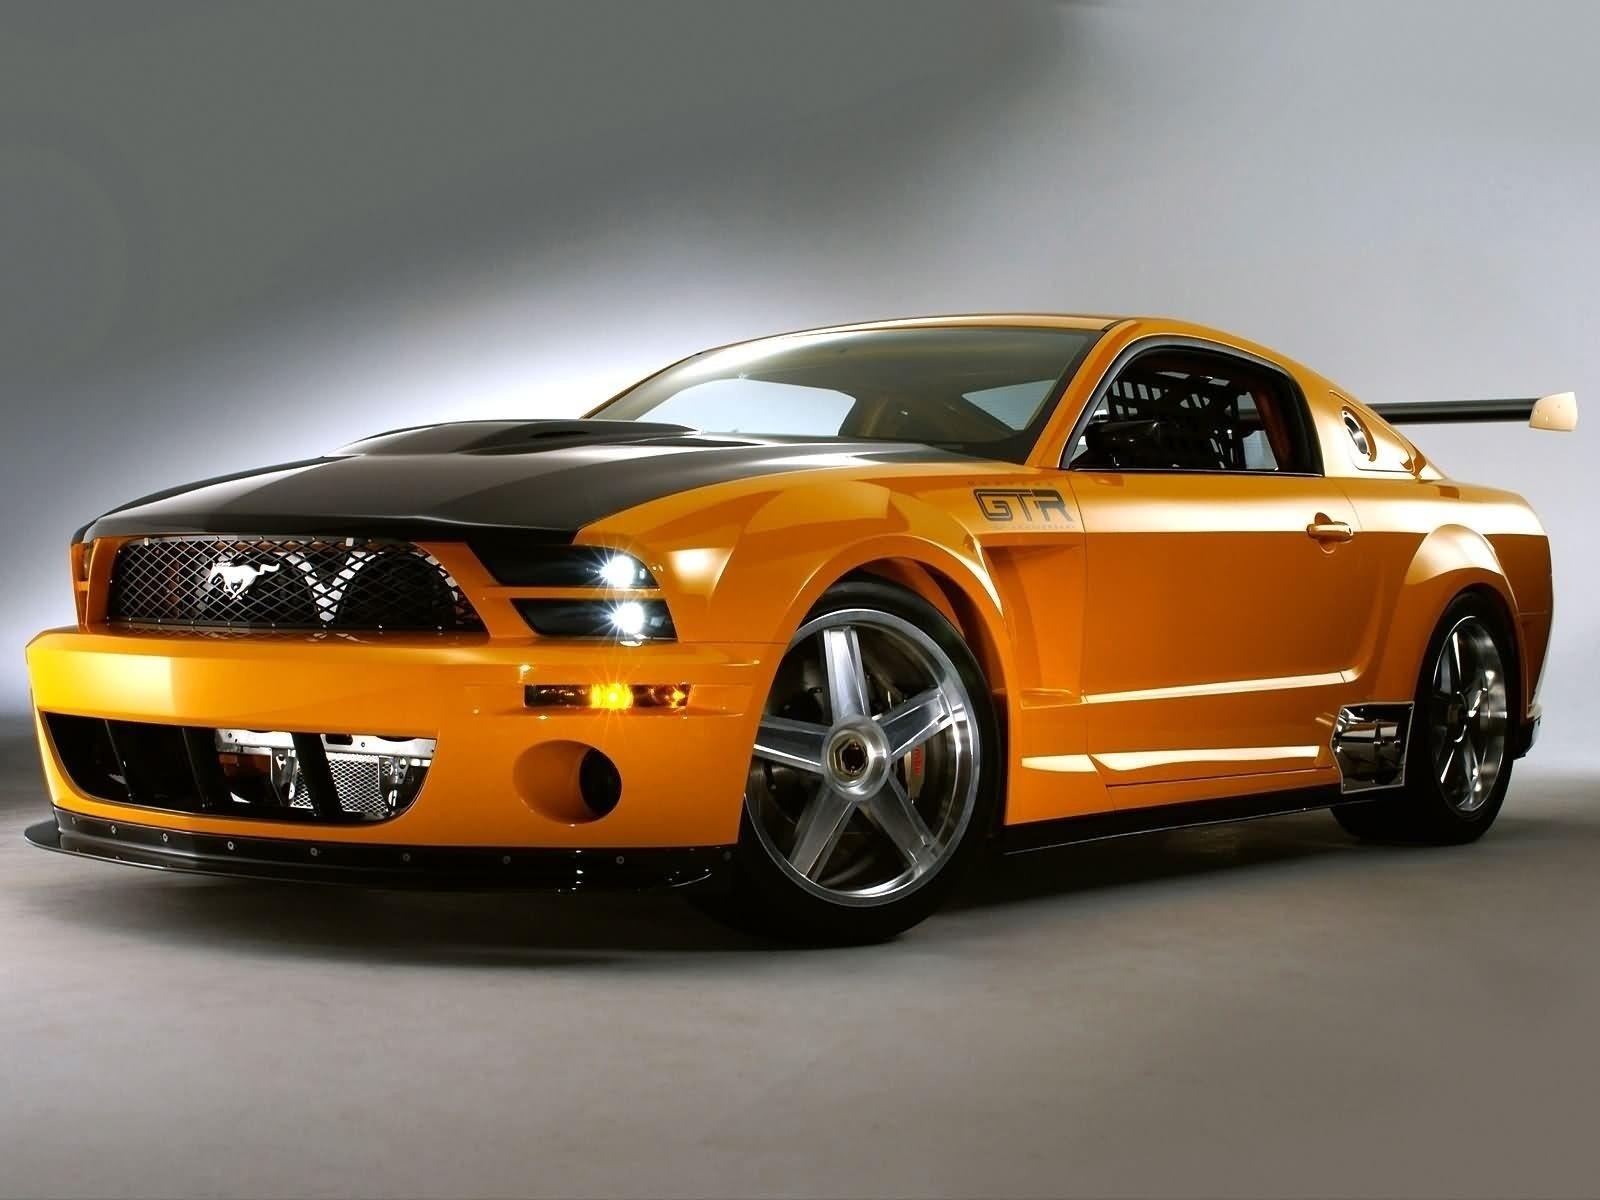 Wallpaper Ford Mustang muscle car desktop 5 HD Desktop Wallpapers 1600x1200